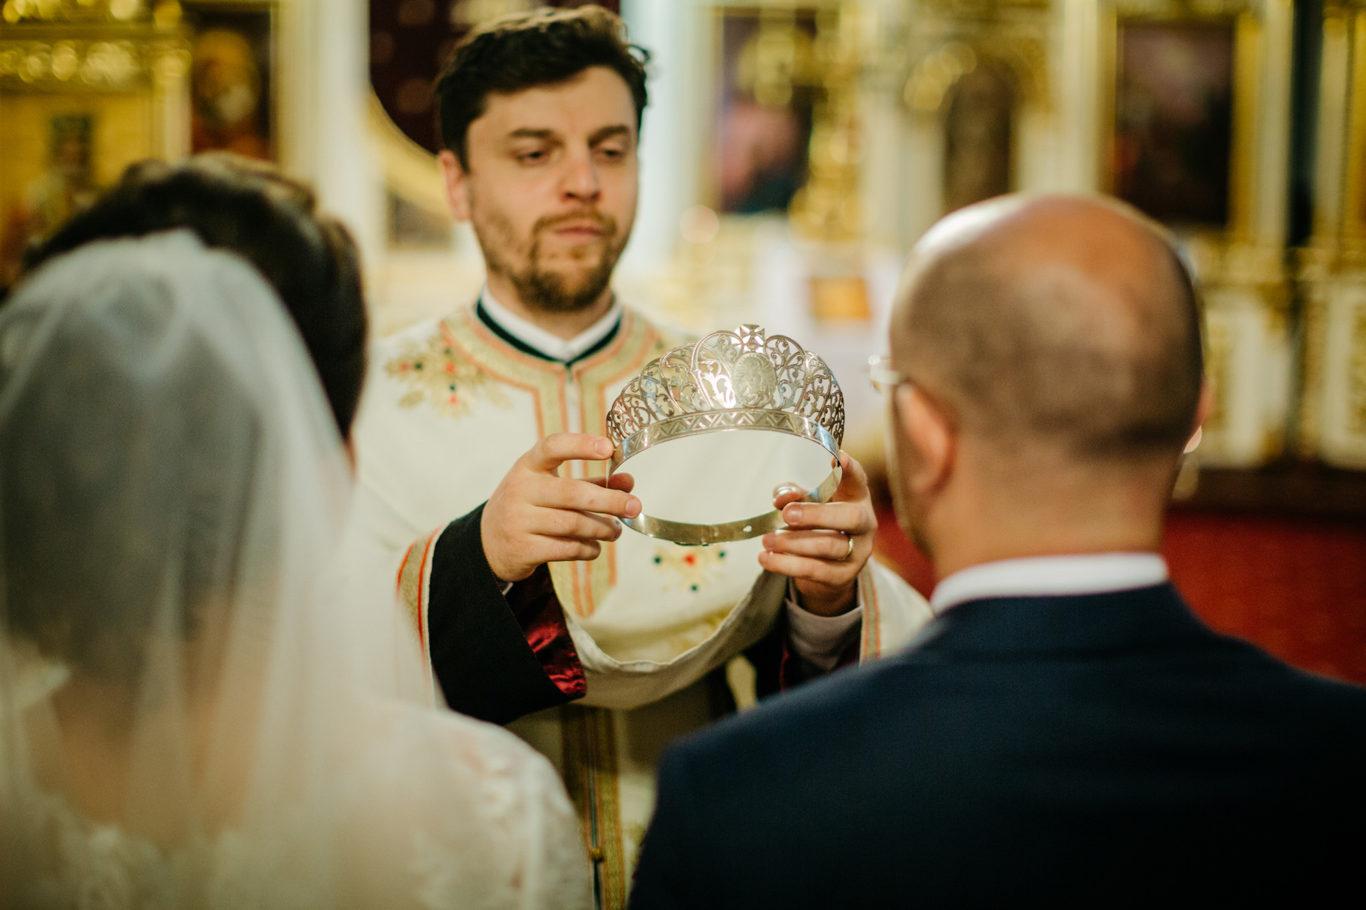 0394-fotografie-nunta-bucuresti-anca-george-fotograf-ciprian-dumitrescu-dcf_4941